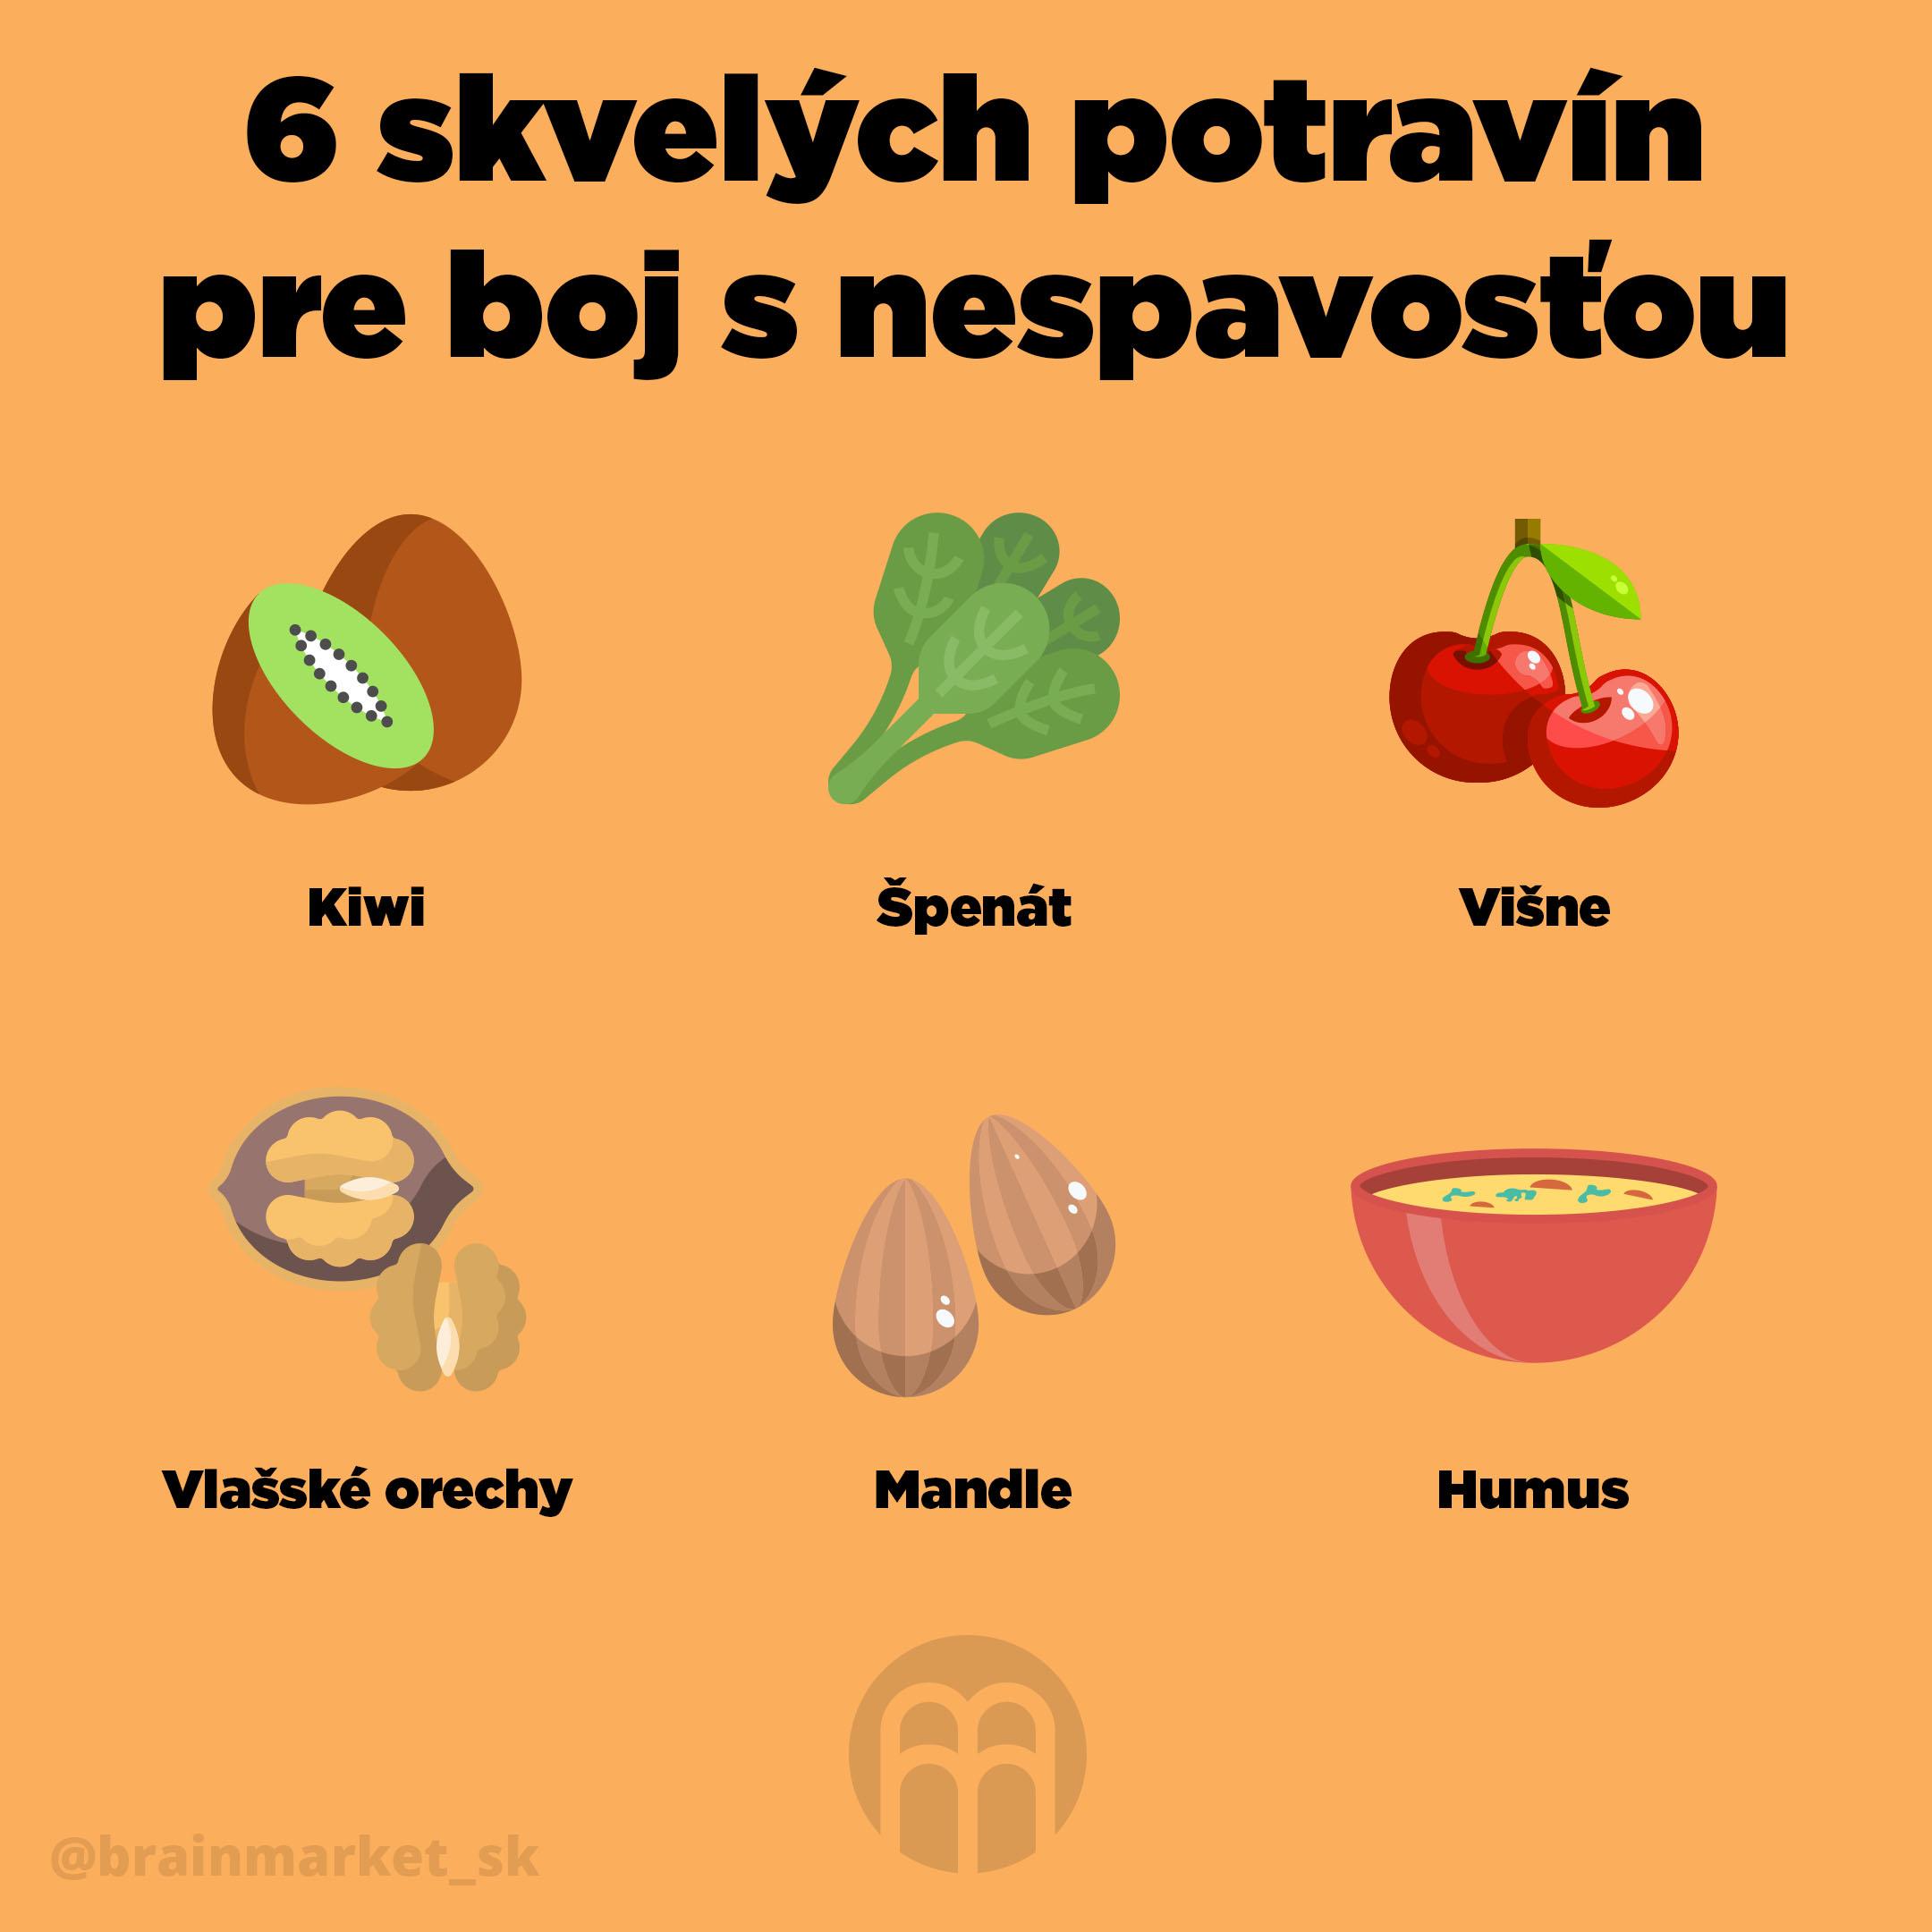 6_potravin_boj_s_nespavostou_Infografika_Instagram_BrainMarket